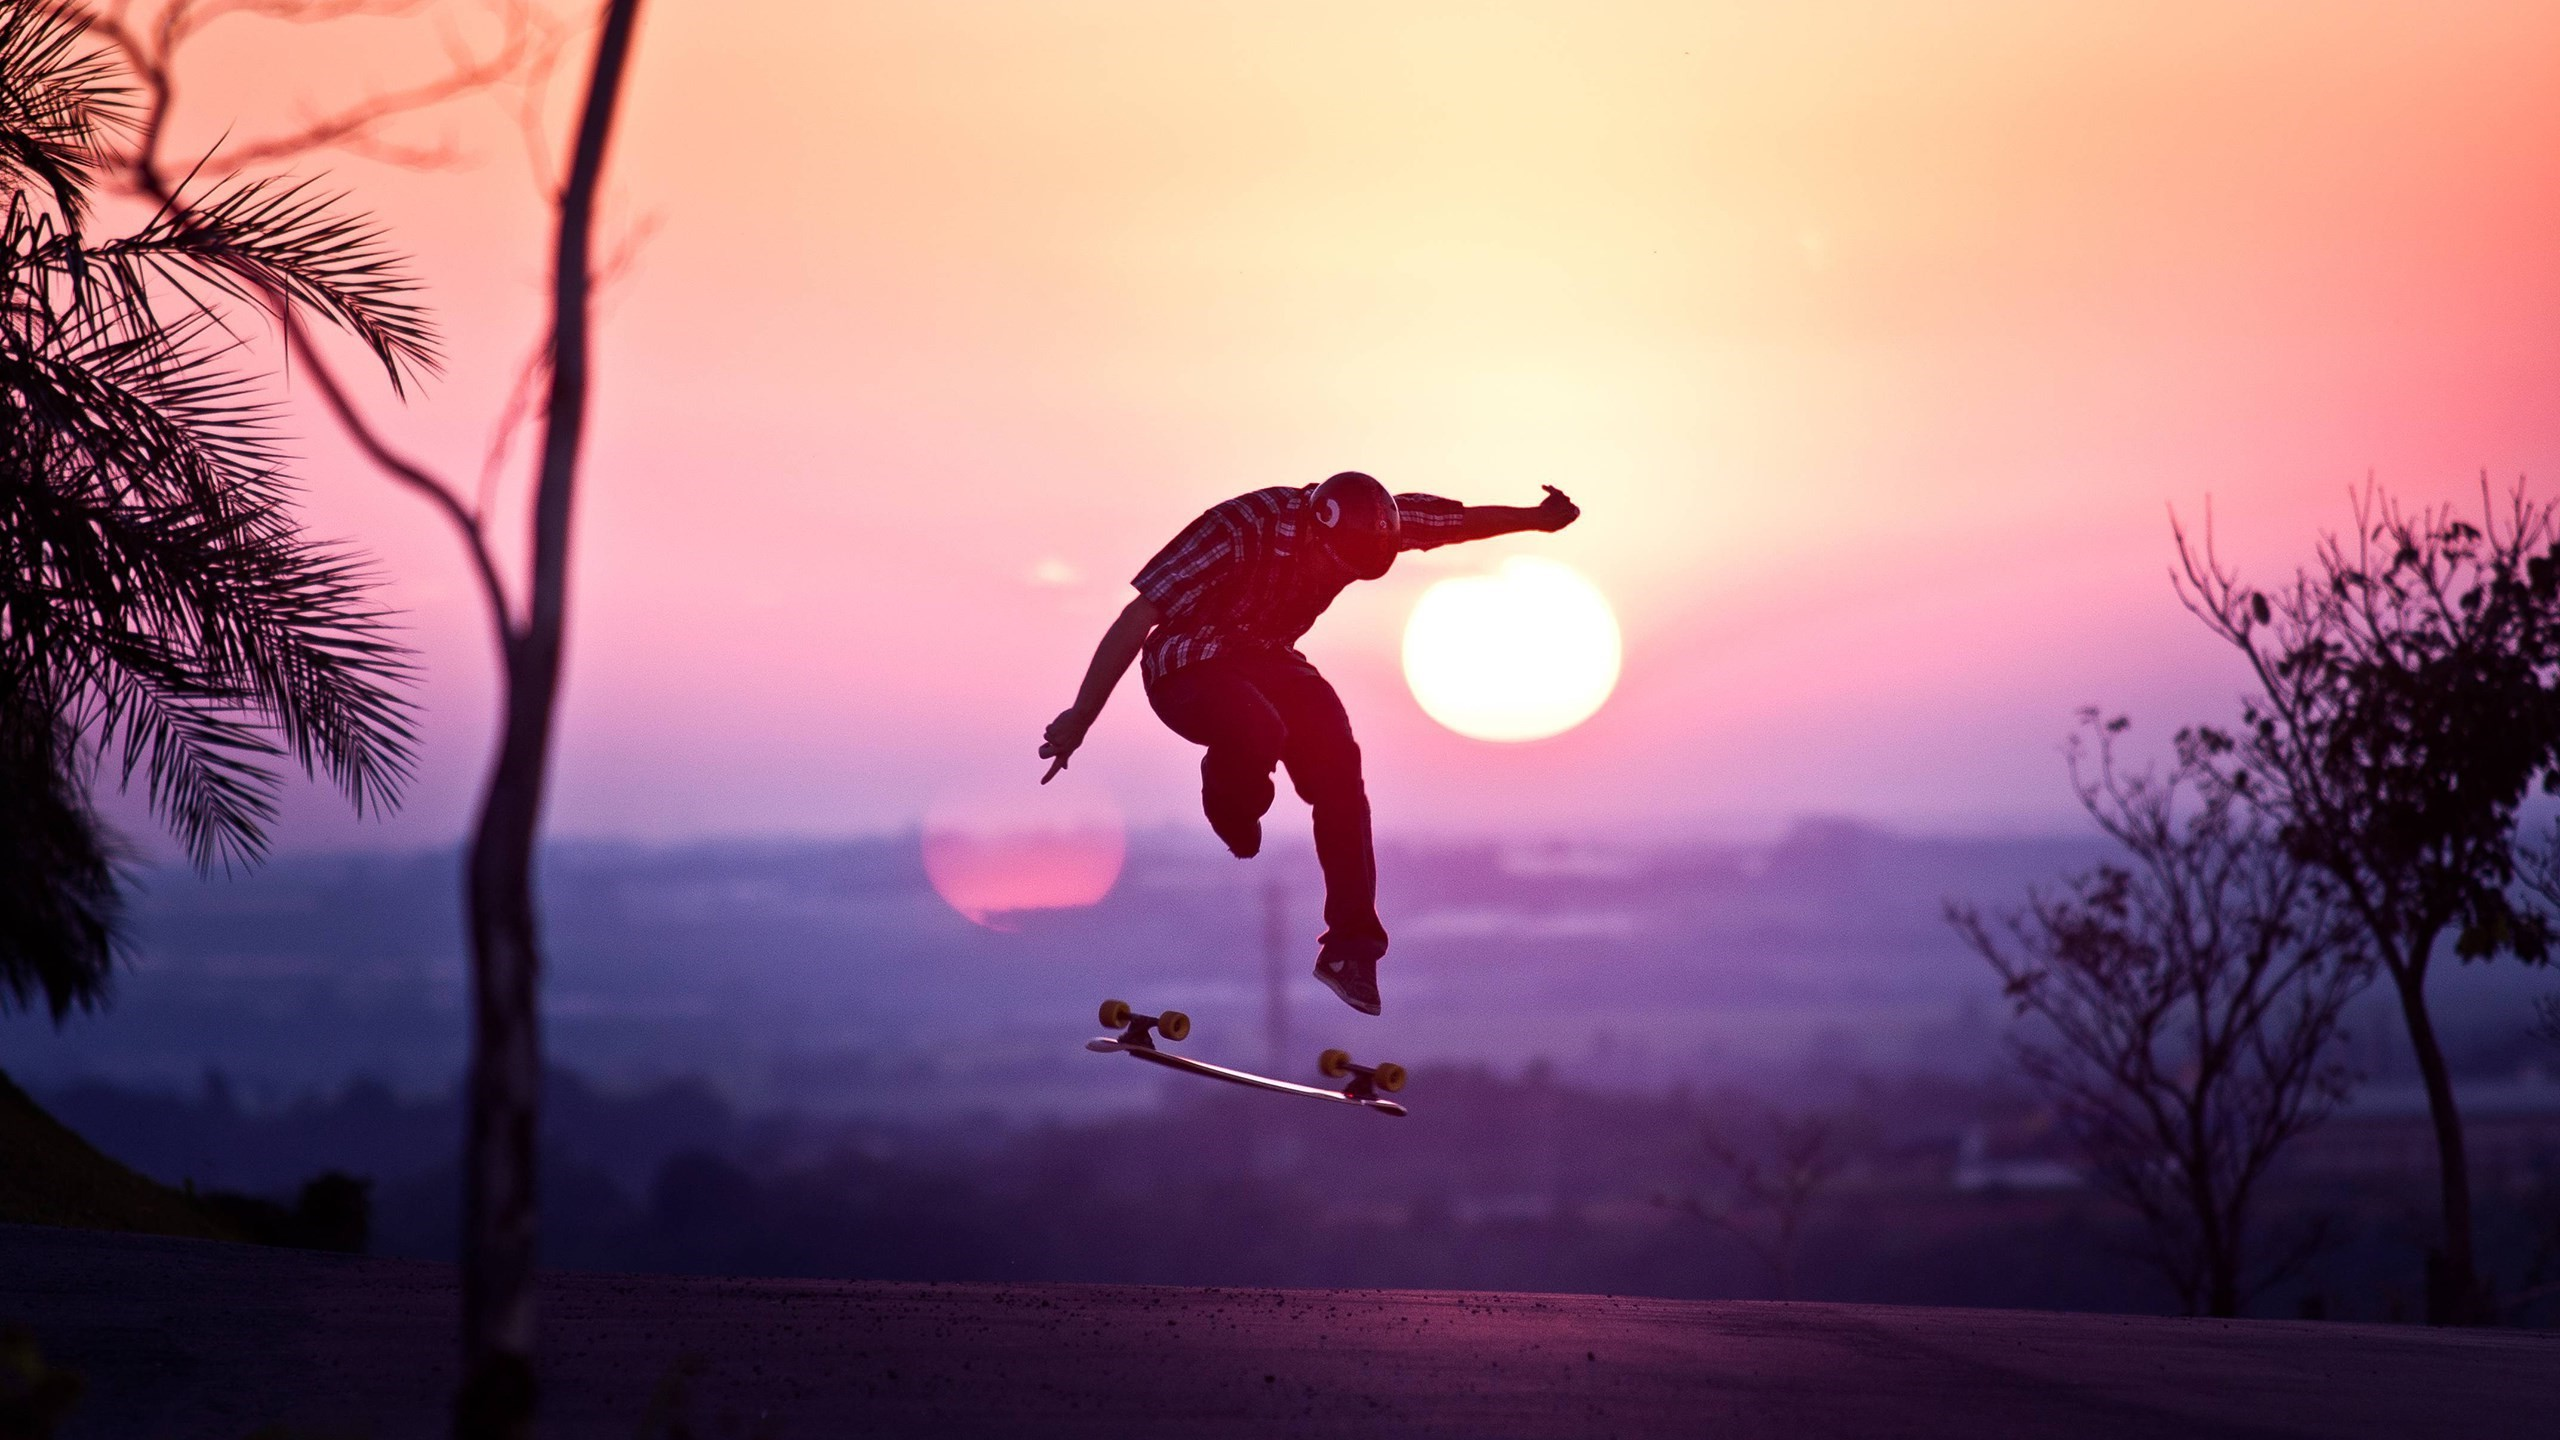 Skateboard Wallpapers Hd 18276 Wallpaper Wallpaper hd 2560x1440